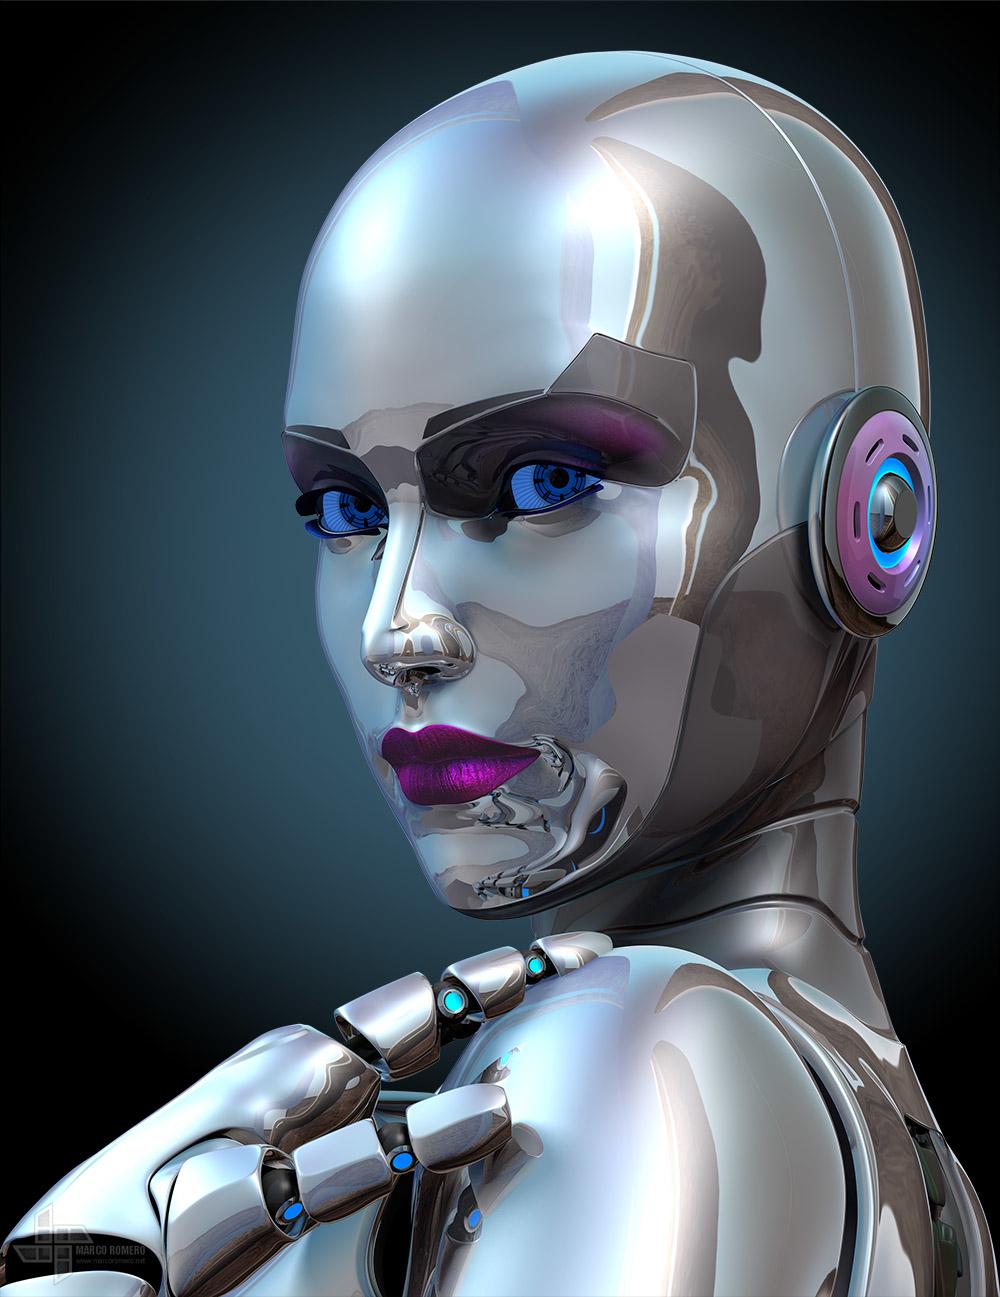 Maromero female robot 1 b0a581ac x9c6